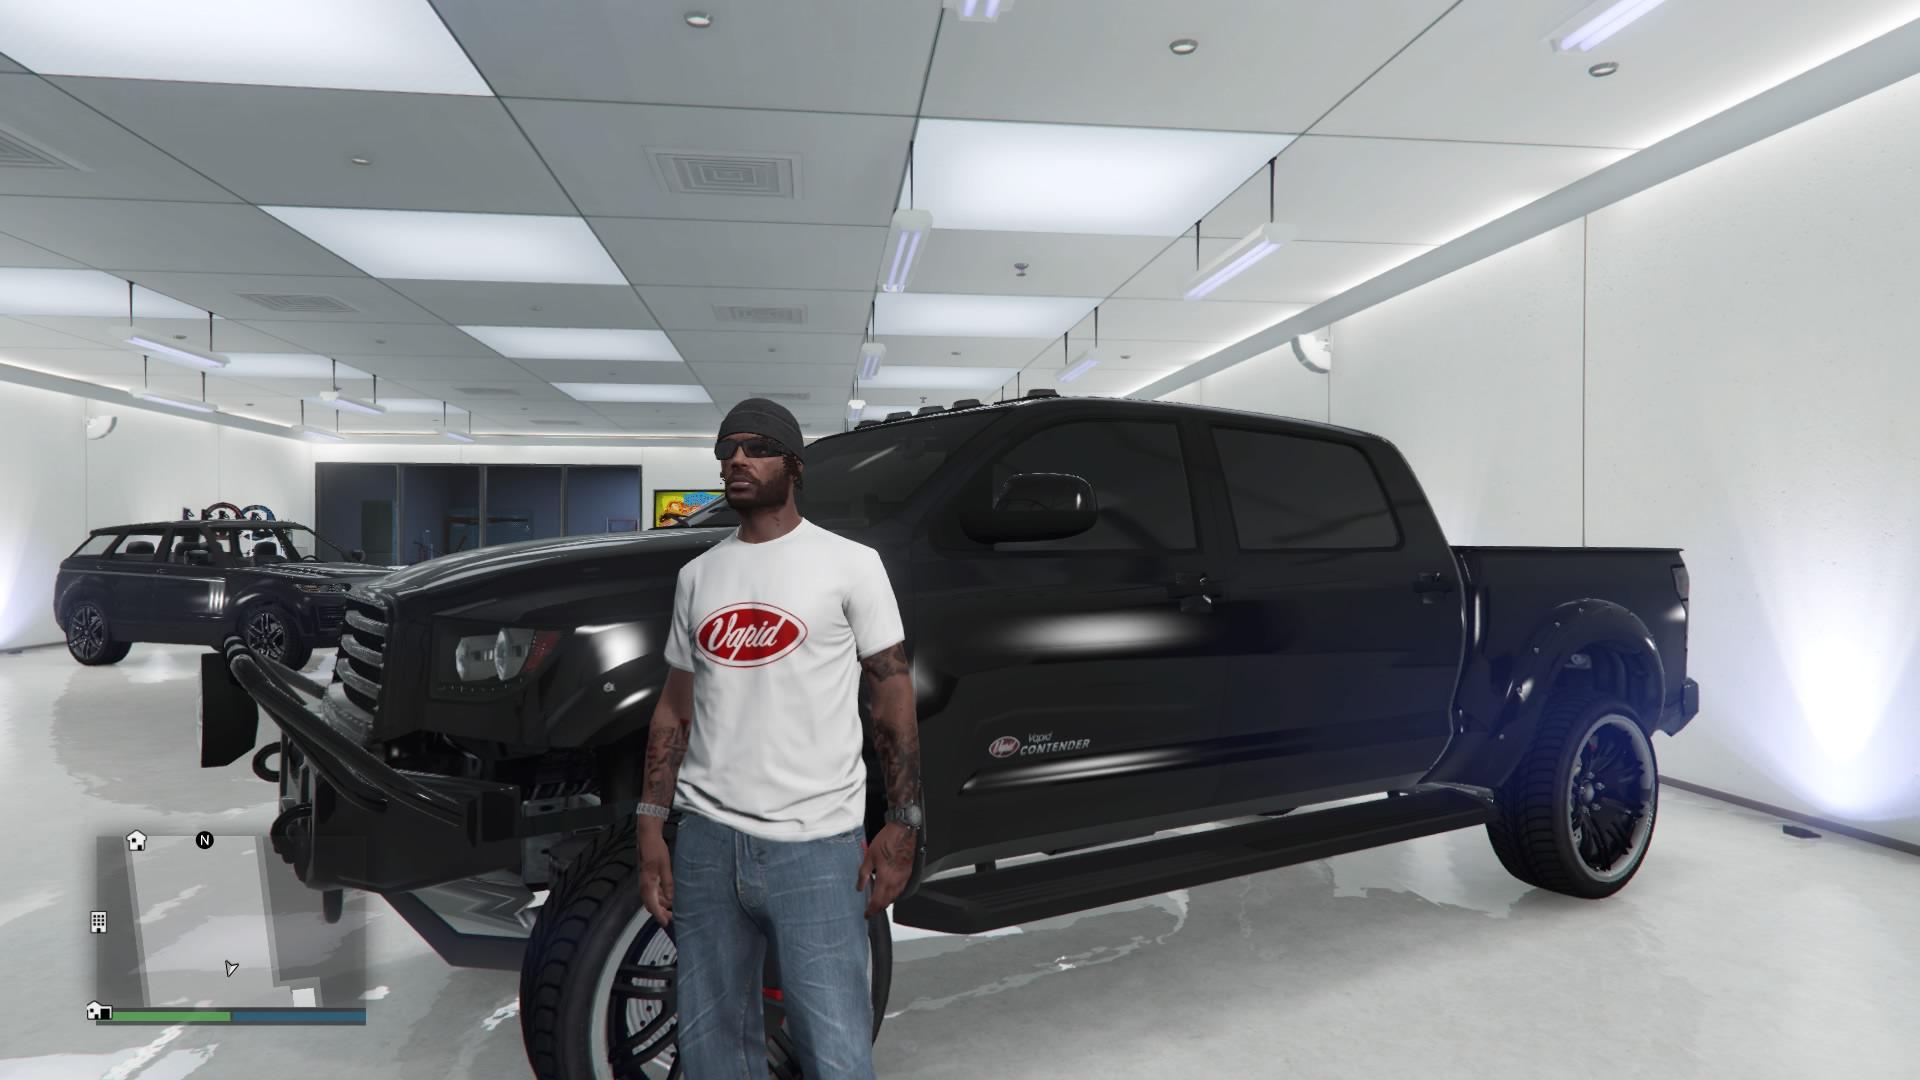 Grand-Theft-Auto-V-20190530005053.jpg